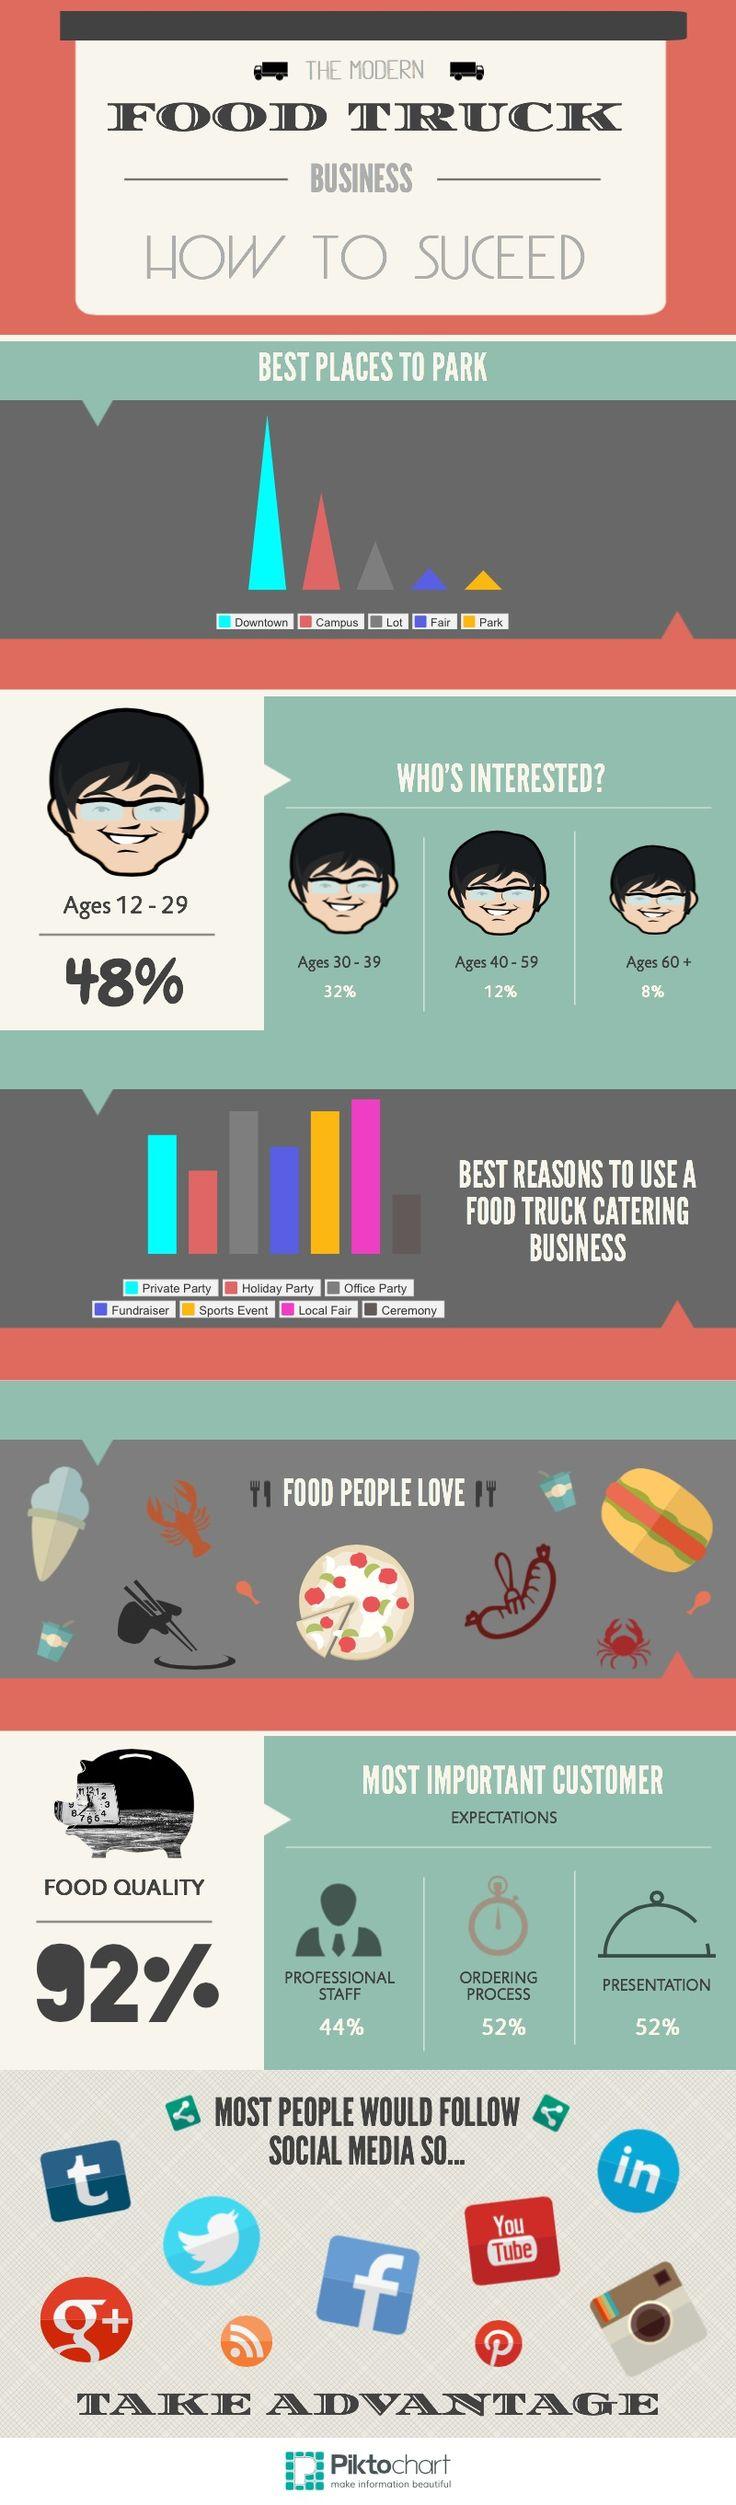 12 best community food kitchen images on Pinterest | Food carts ...